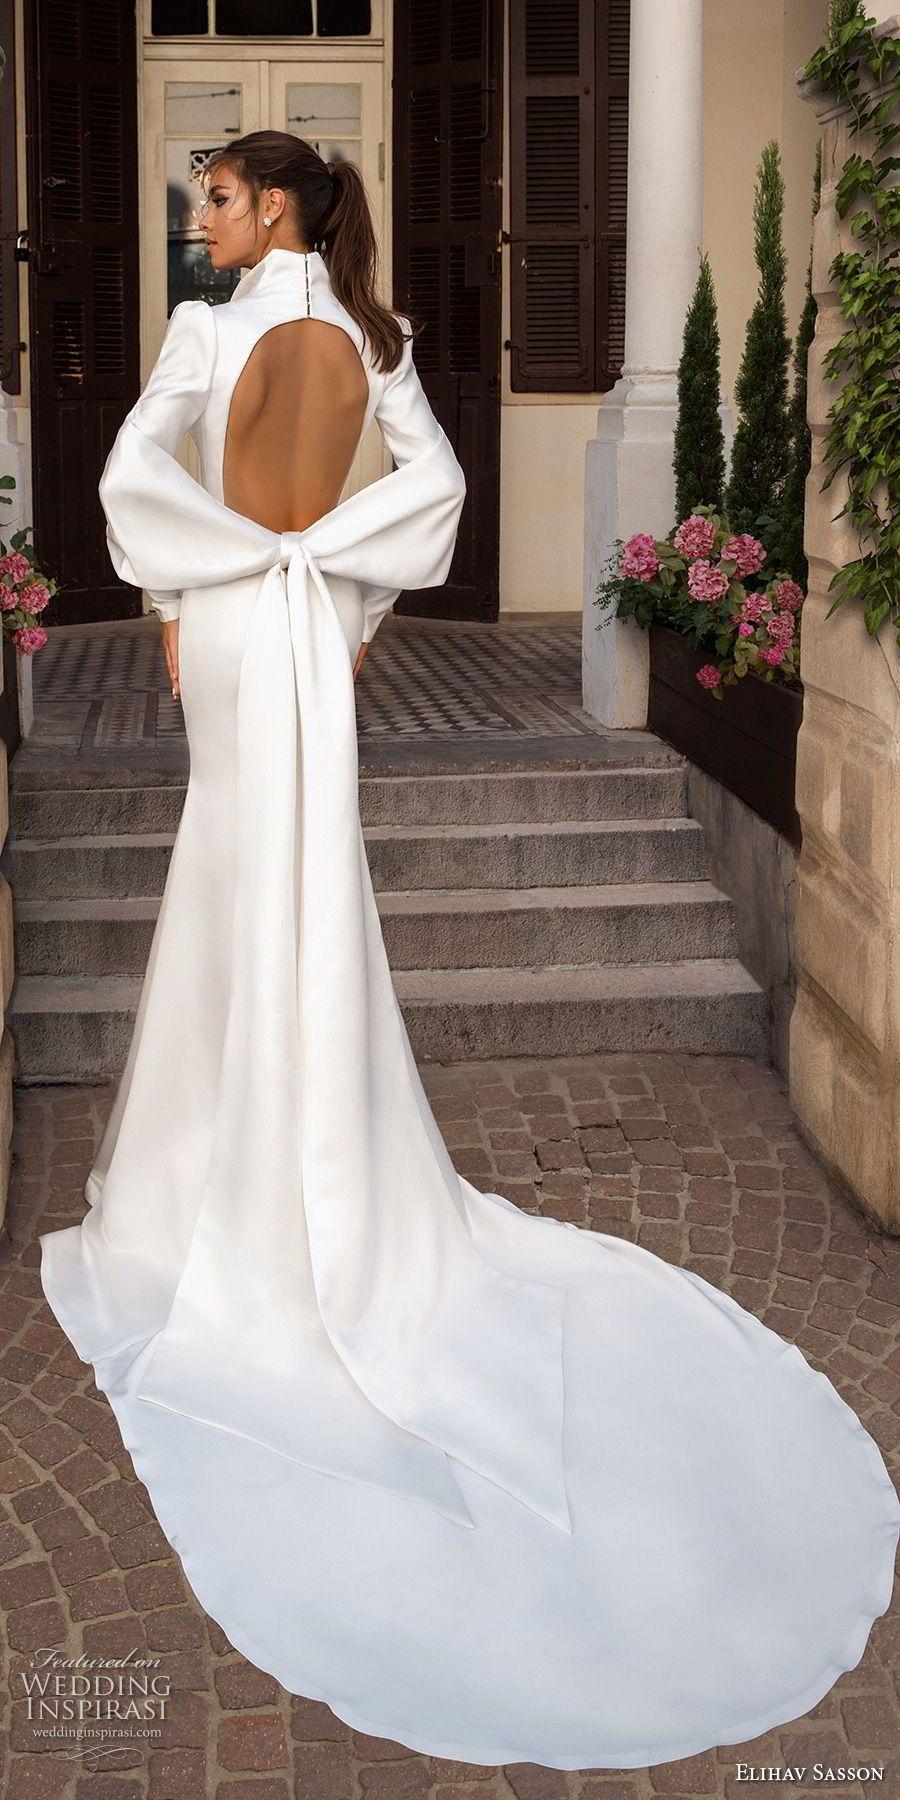 Elihav Sasson 2018 Royalty Girl Capsule Collection | Wedding dress ...